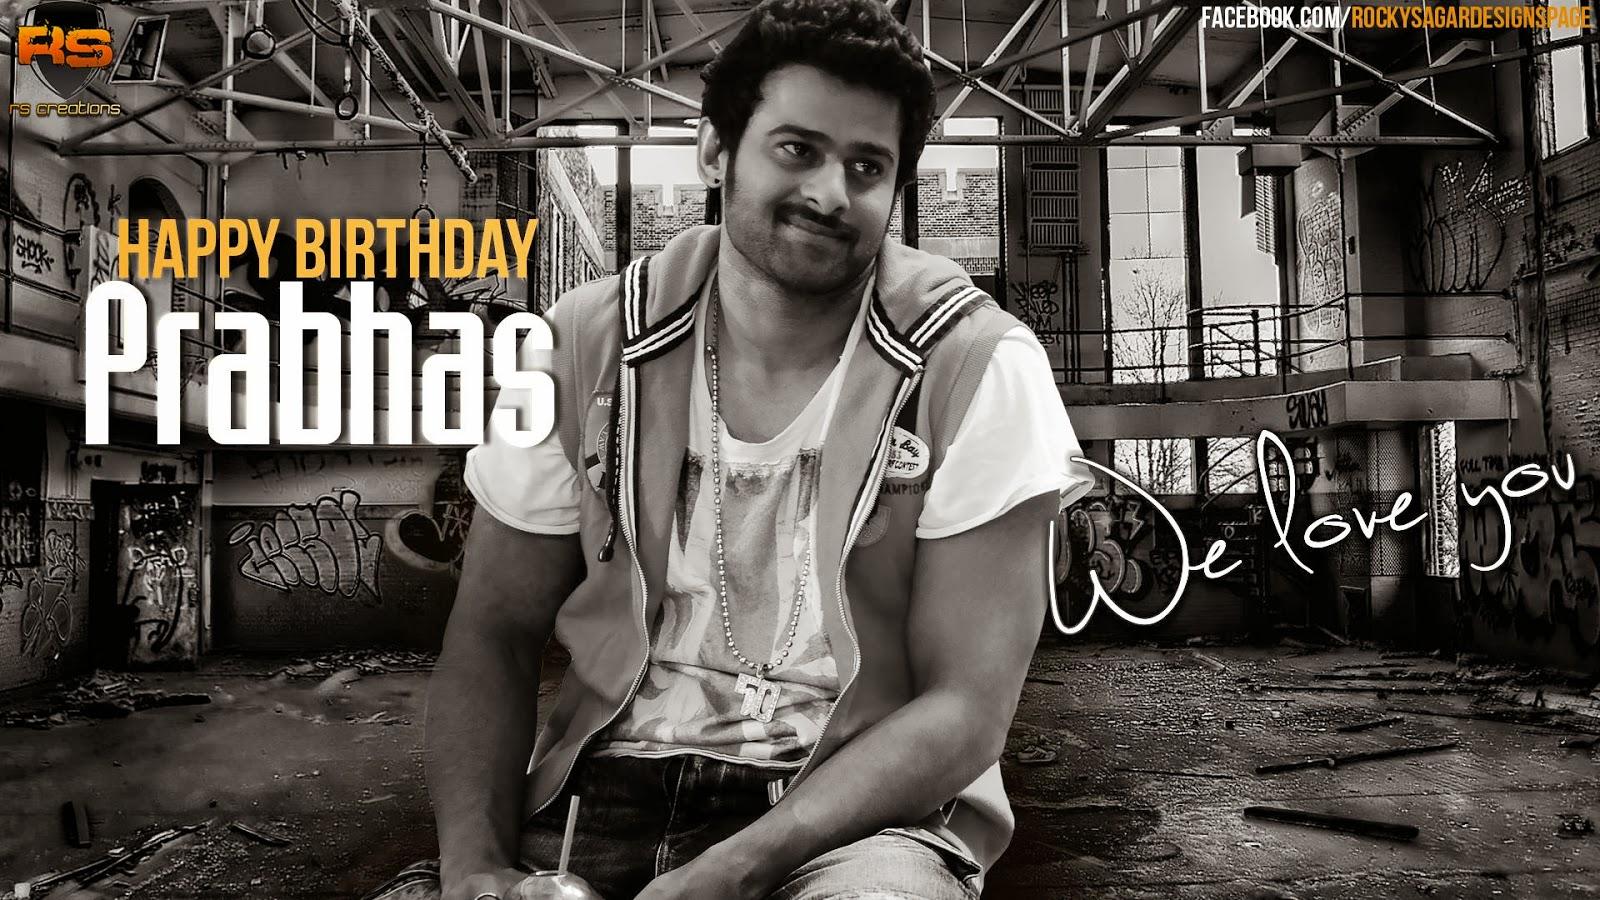 Prabhas Designs: Happy Birthday Prabhas- Set 1